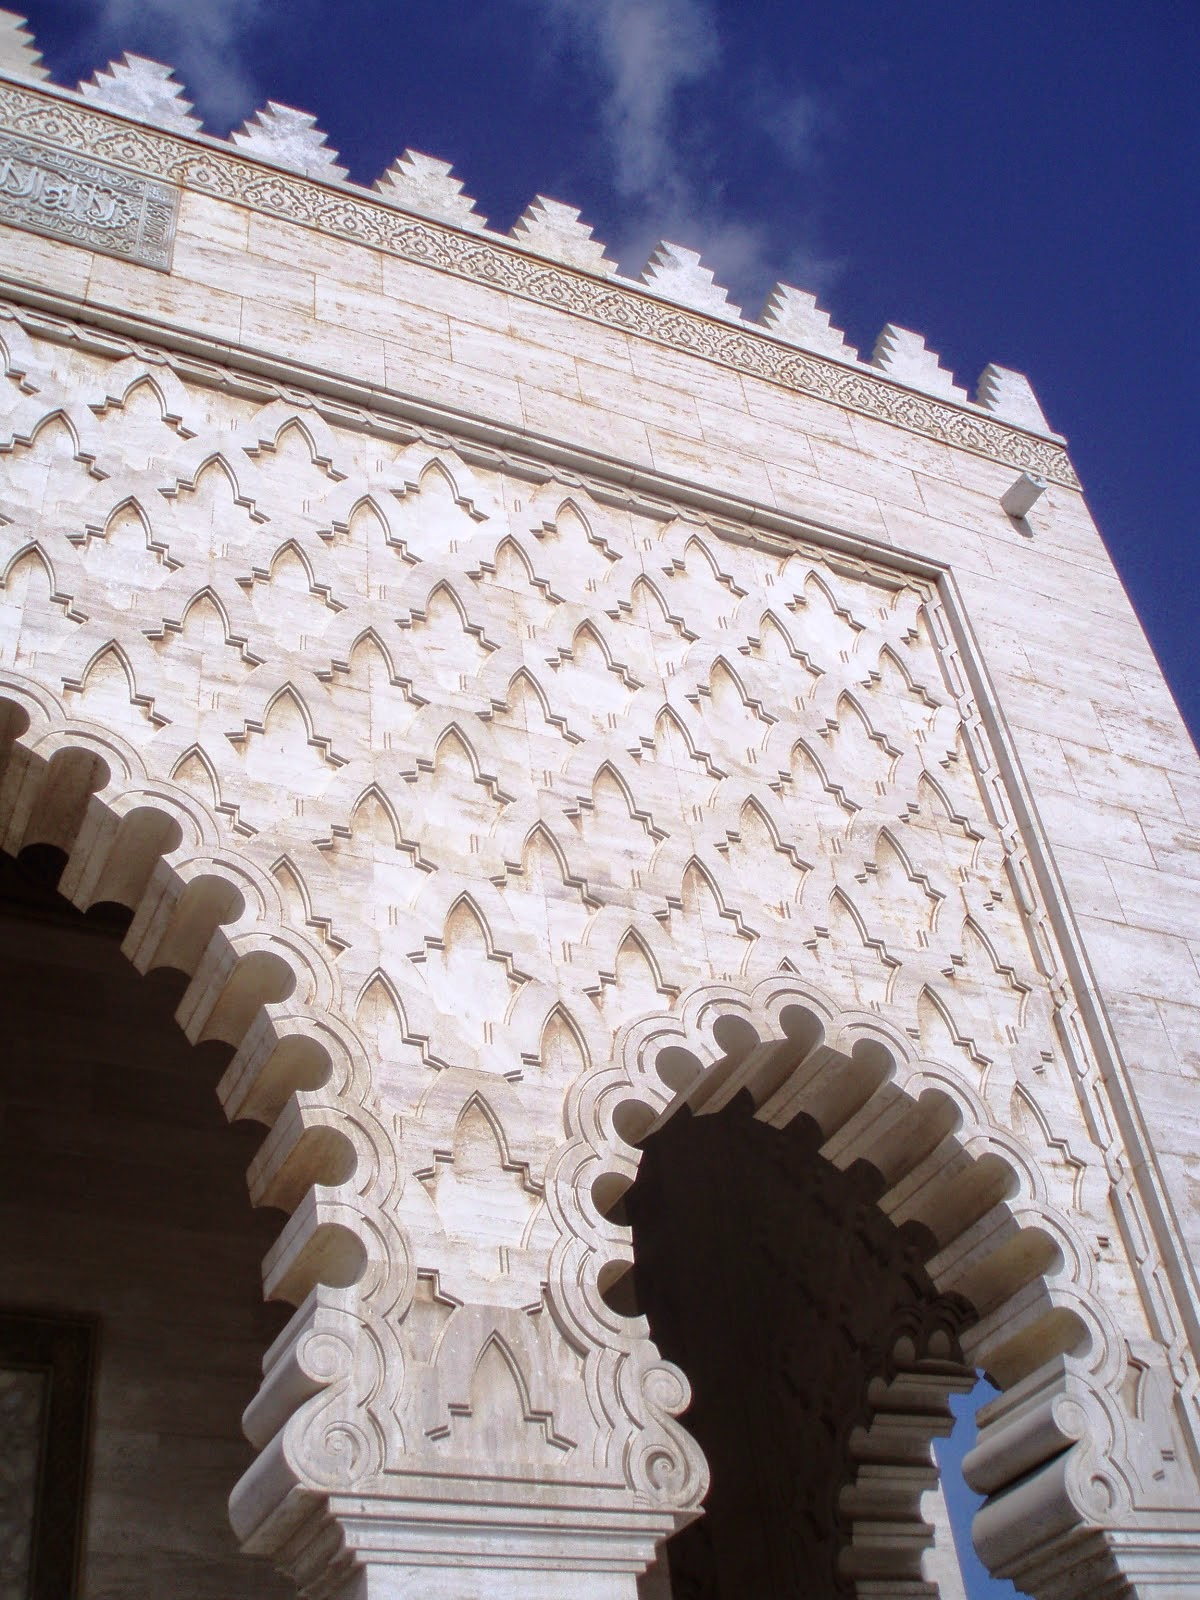 travelifehistory: Meknes to Rabat - Morocco Diary